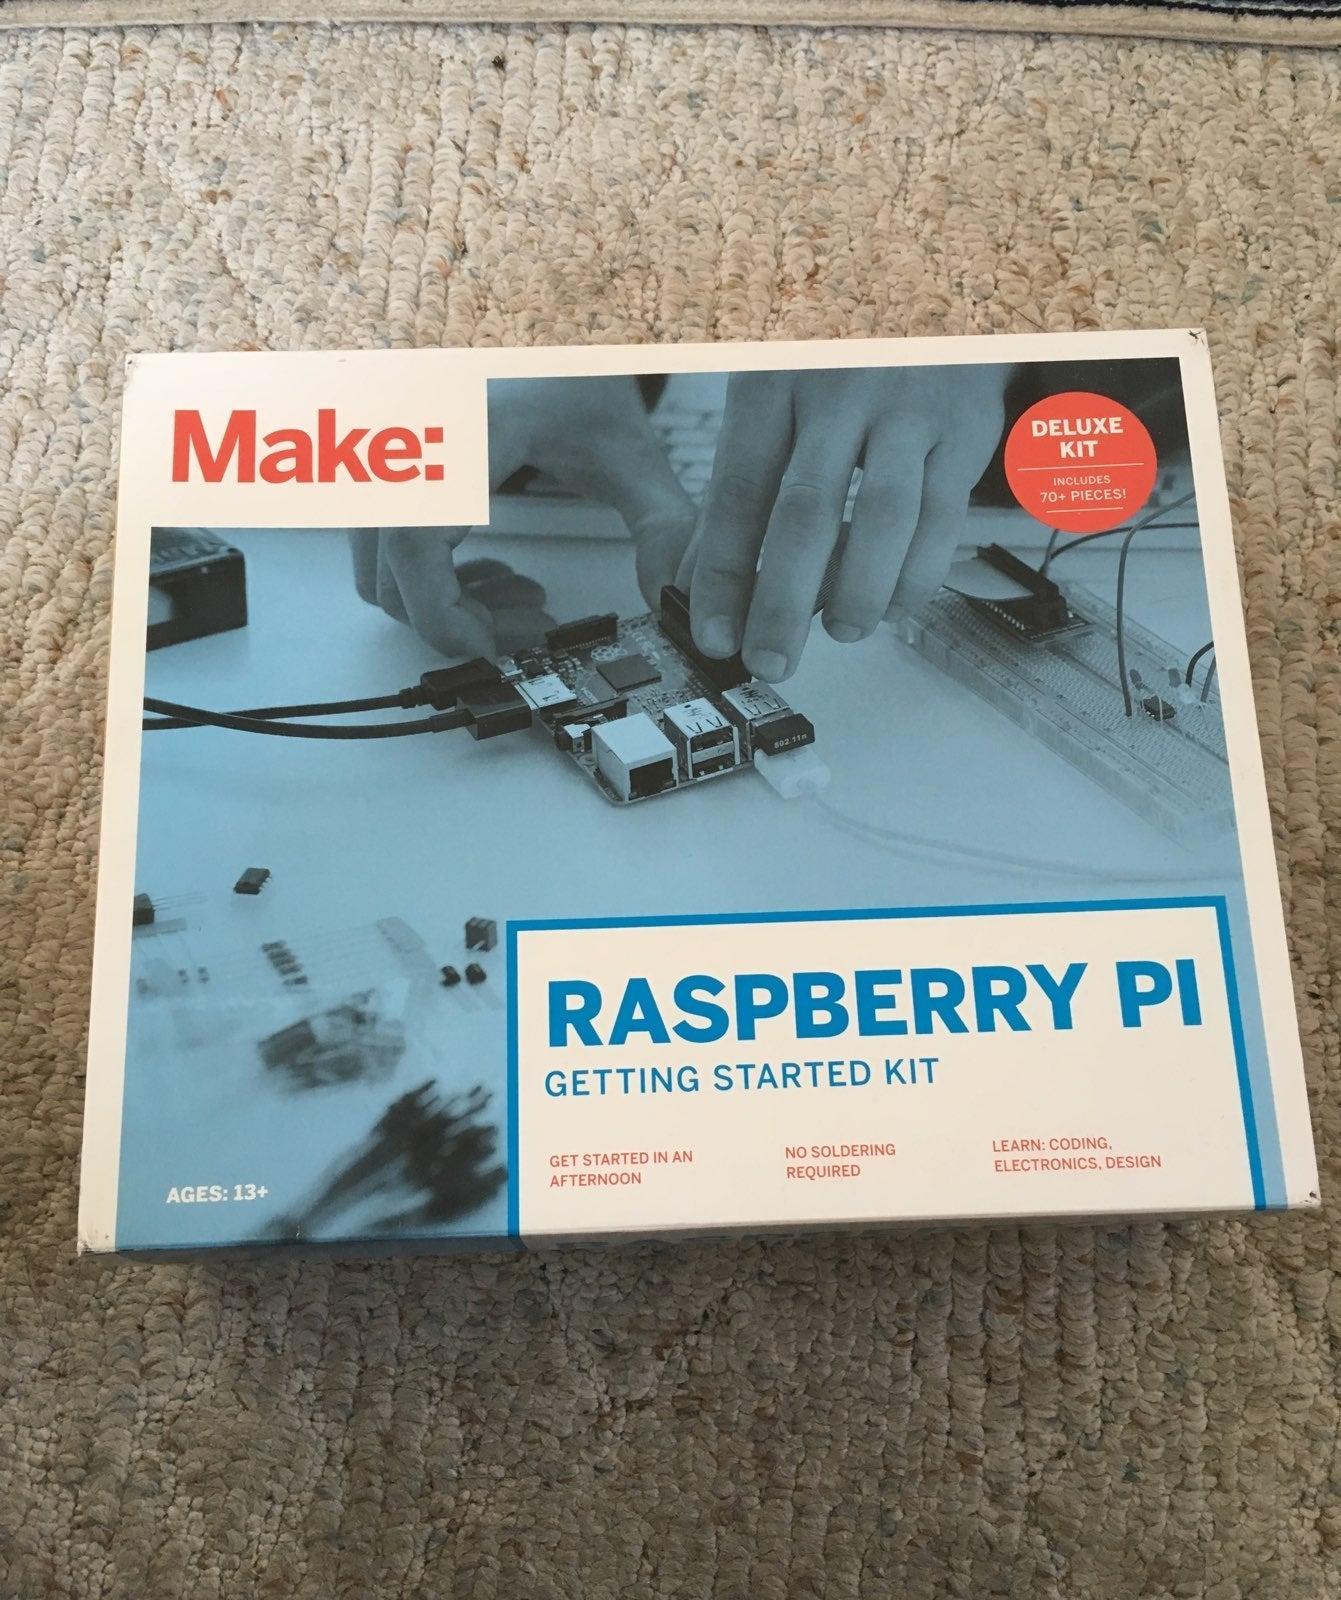 Make: Rasberry Pi Deluxe kit